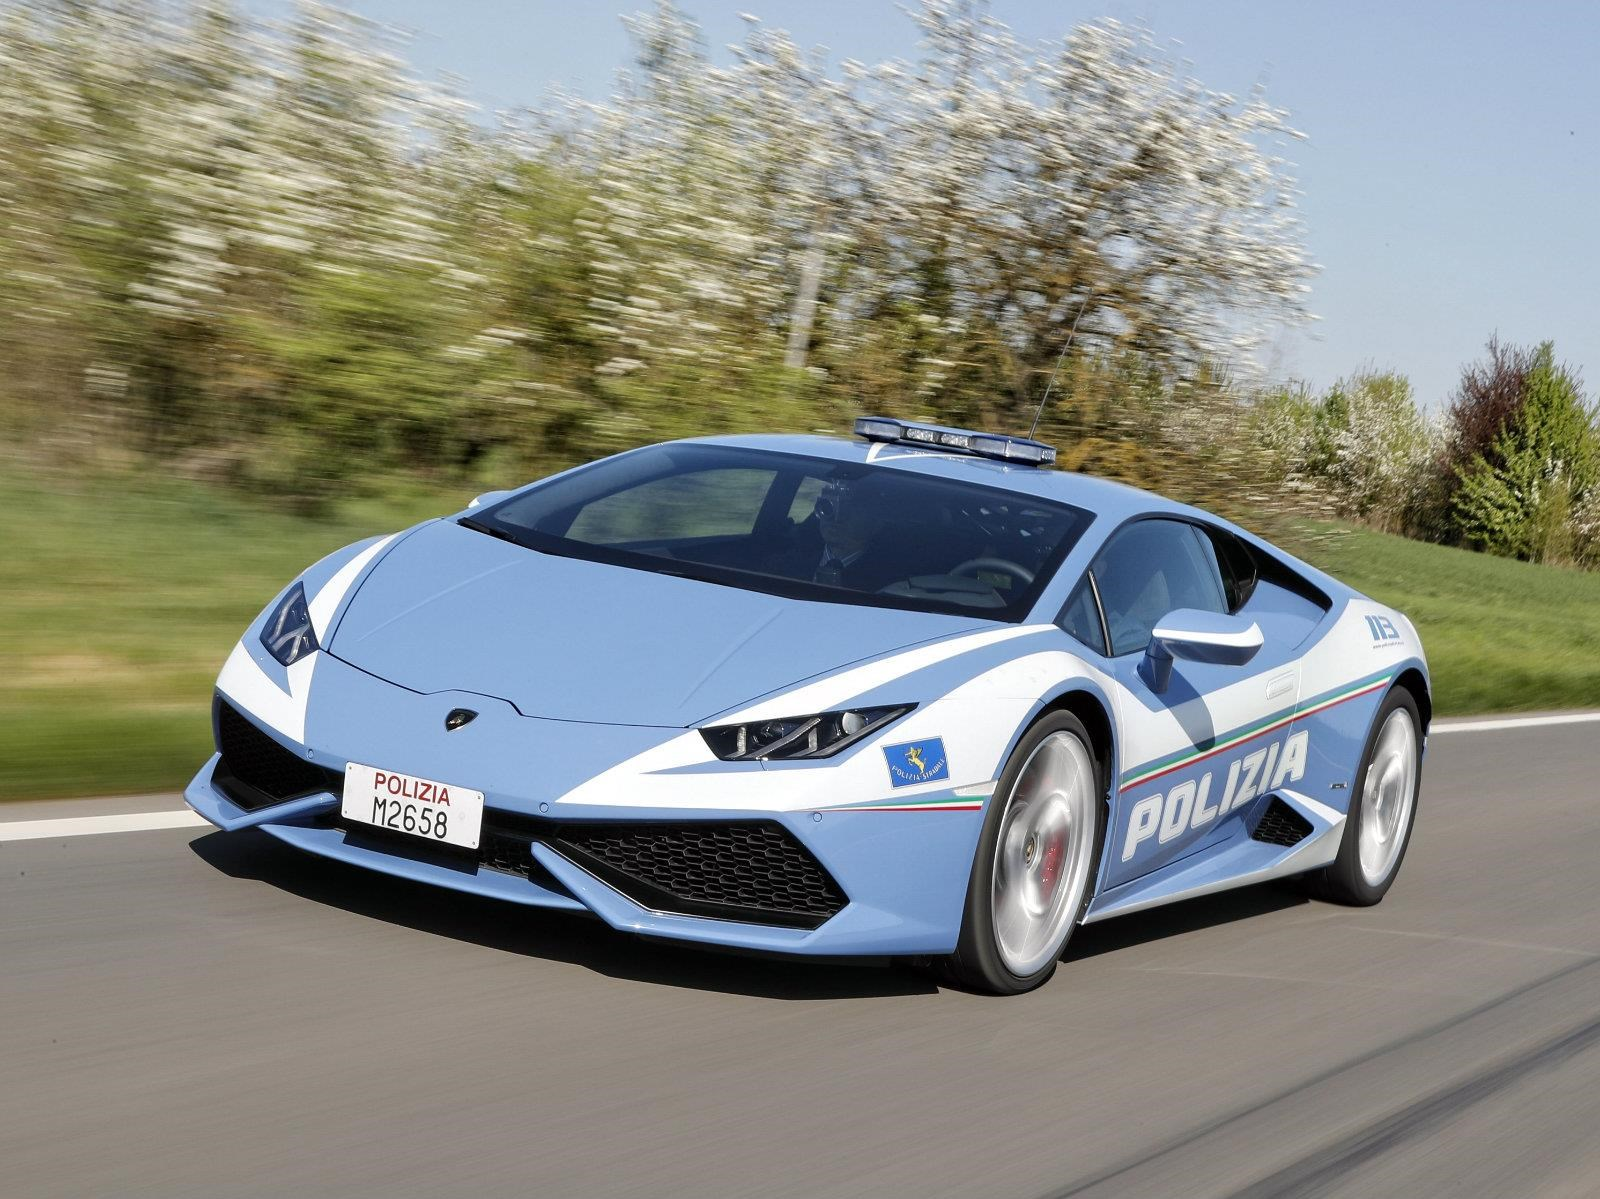 Italia, a lo Need For Speed con el Lamborghini Huracán Polizia